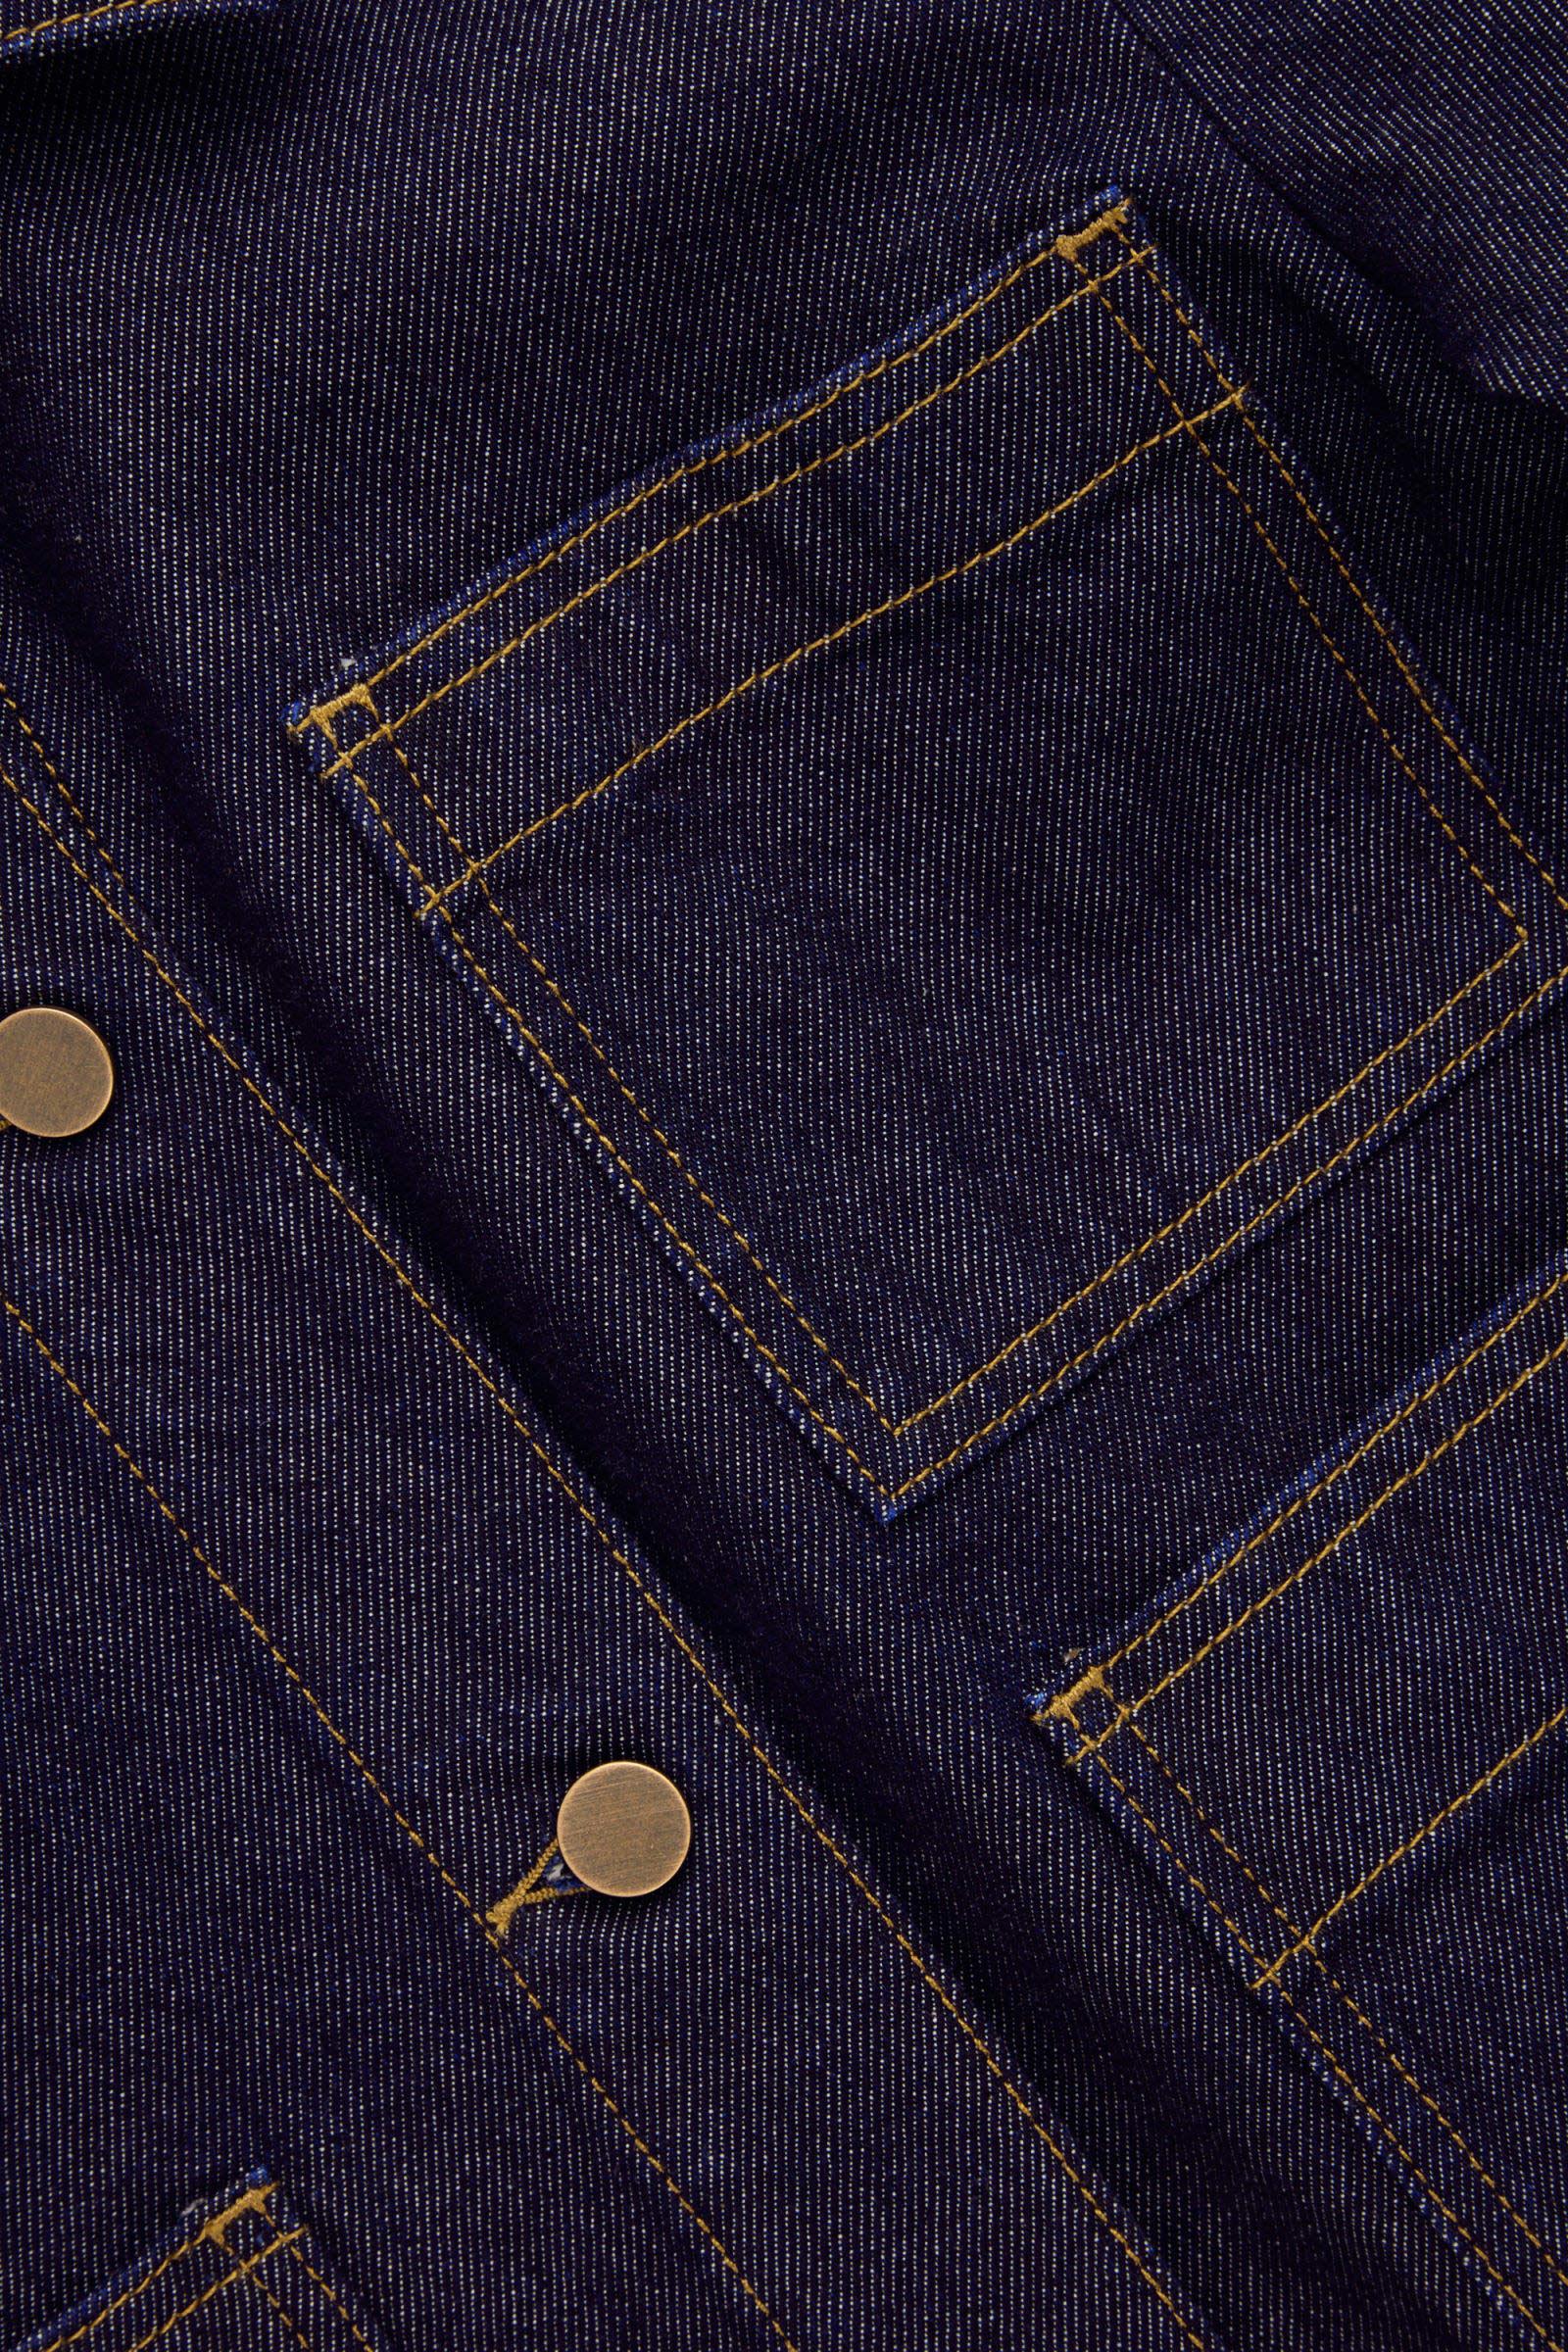 COS 패치 포켓 데님 재킷의 다크 블루 / 토바코컬러 상세컷입니다.